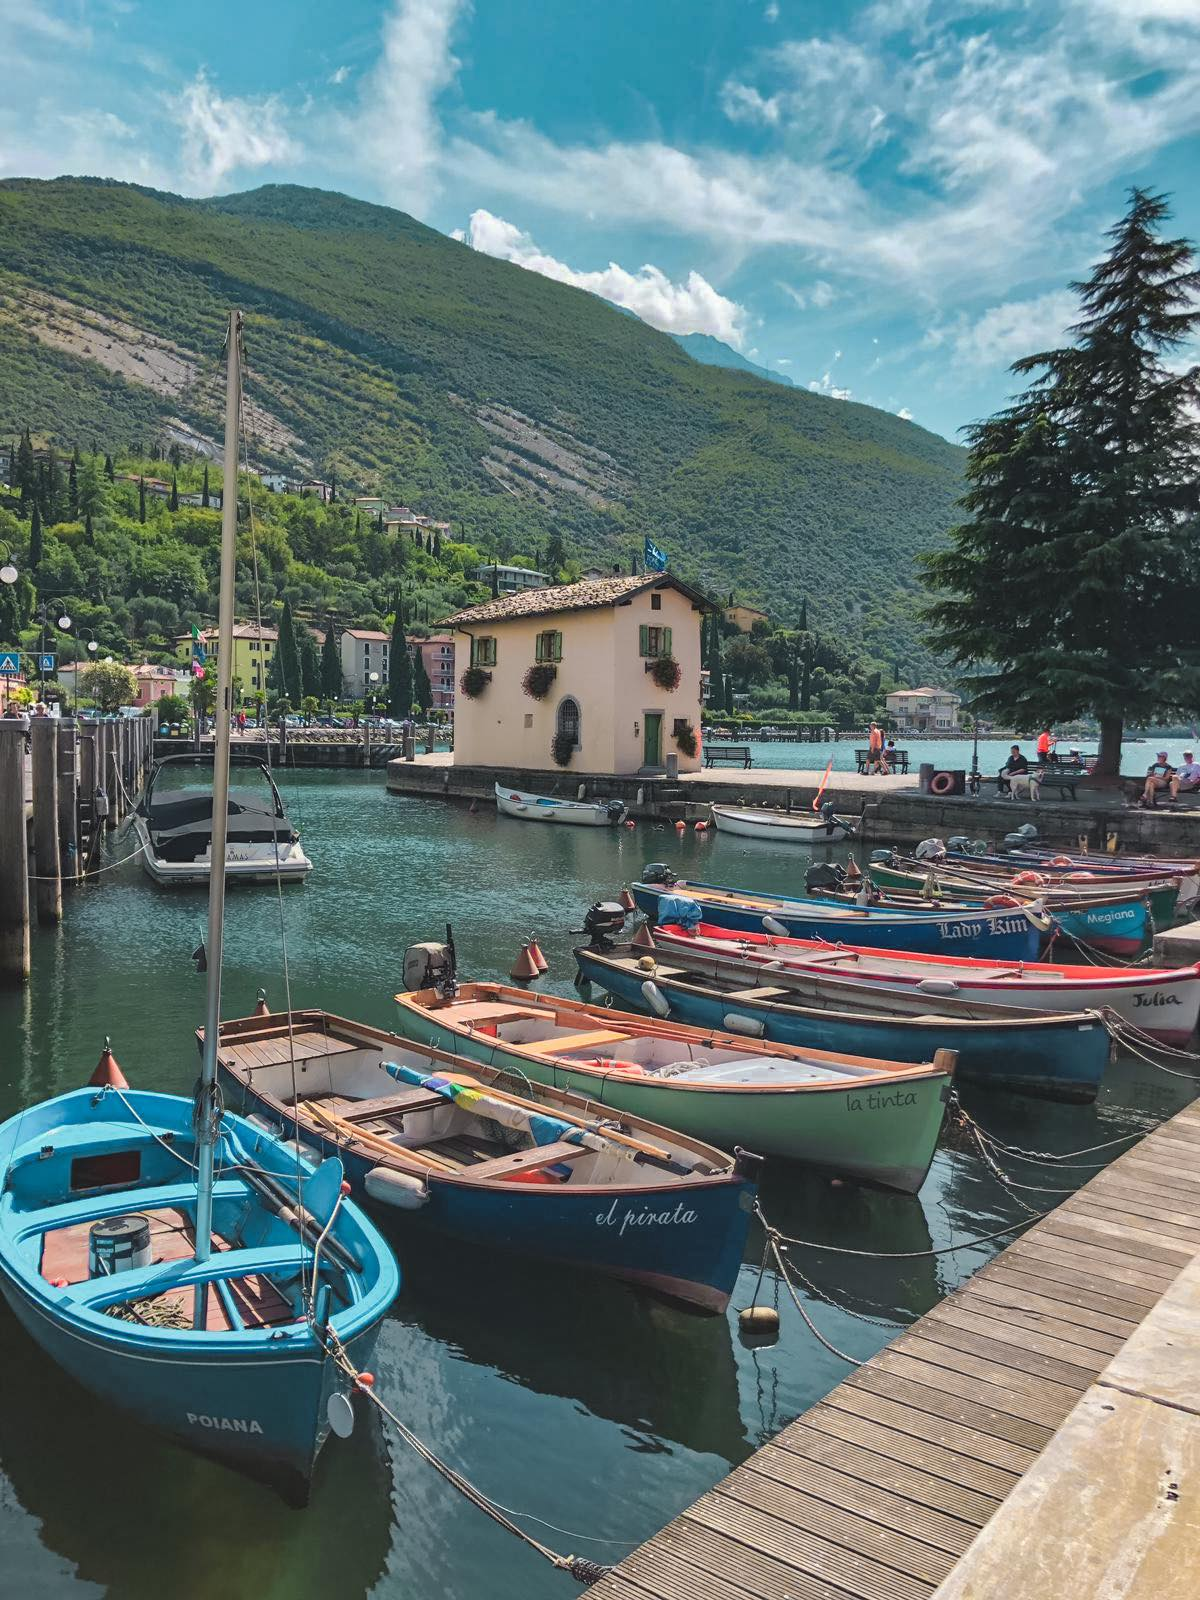 Life On The Road Day 131 Hello from Lago di Garda, ITALY20.jpg